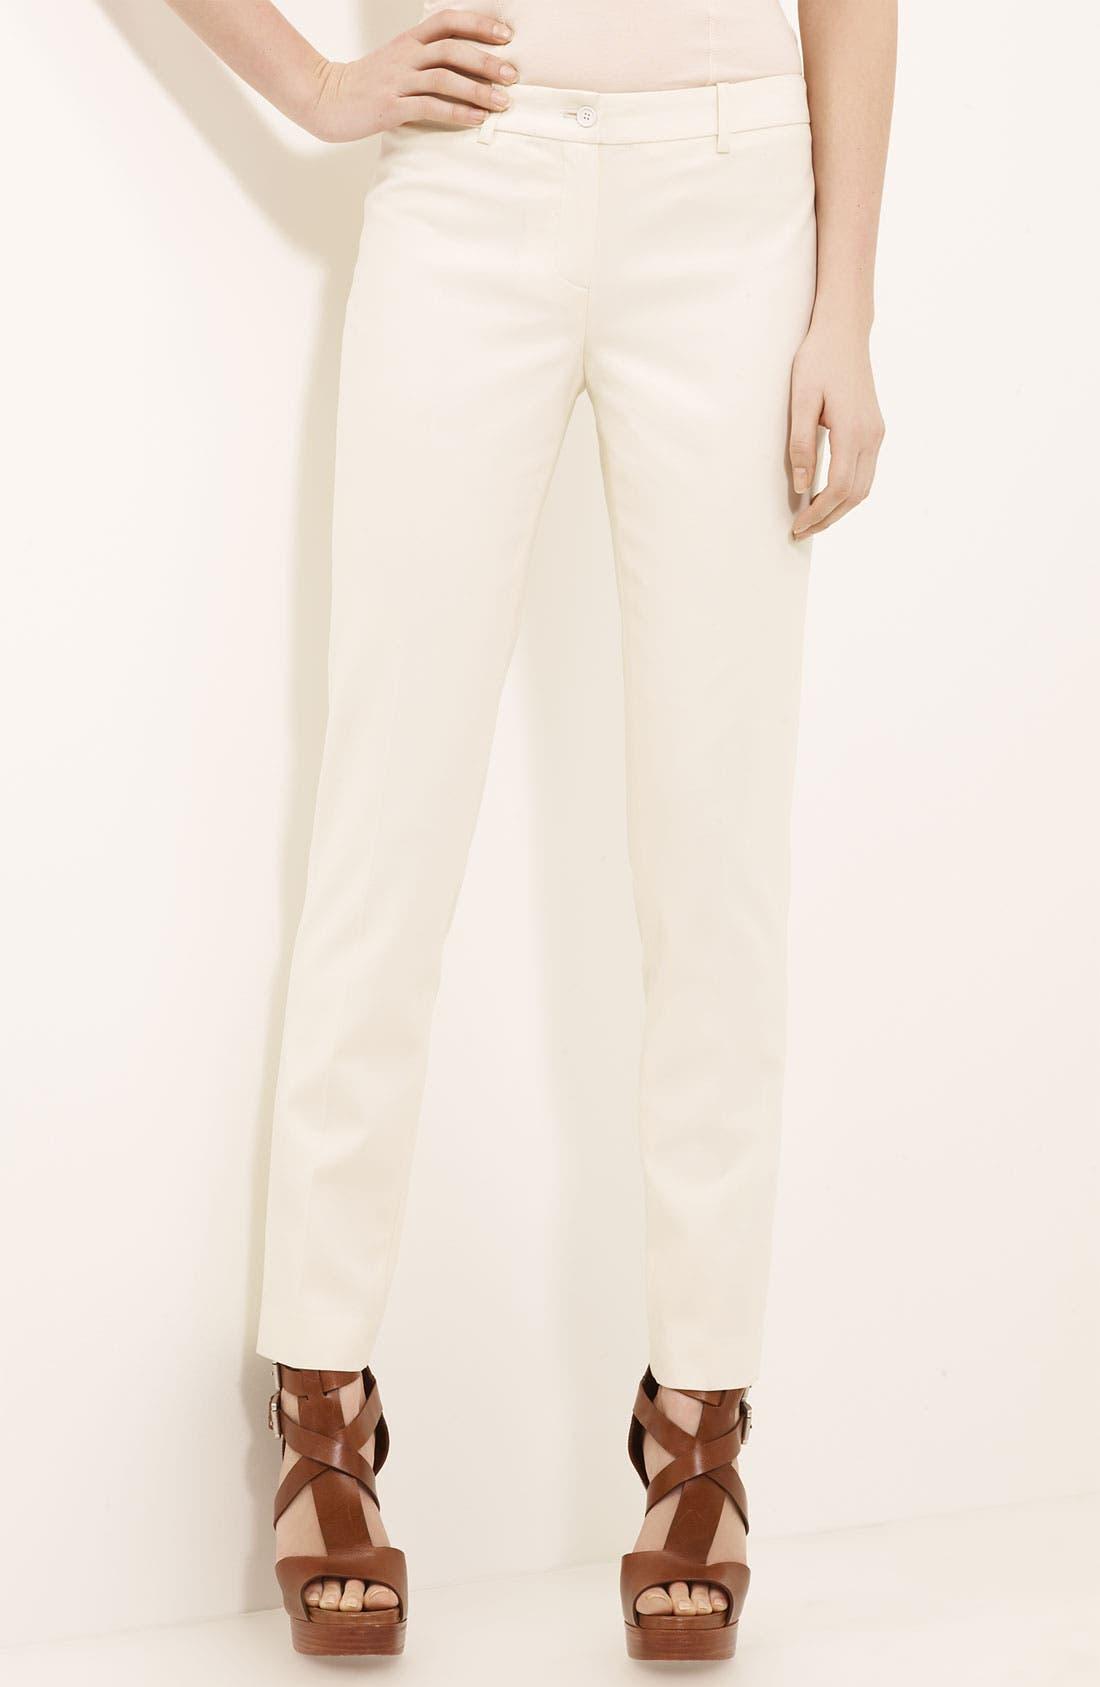 Alternate Image 1 Selected - Michael Kors 'Samantha' Skinny Wool Serge Pants